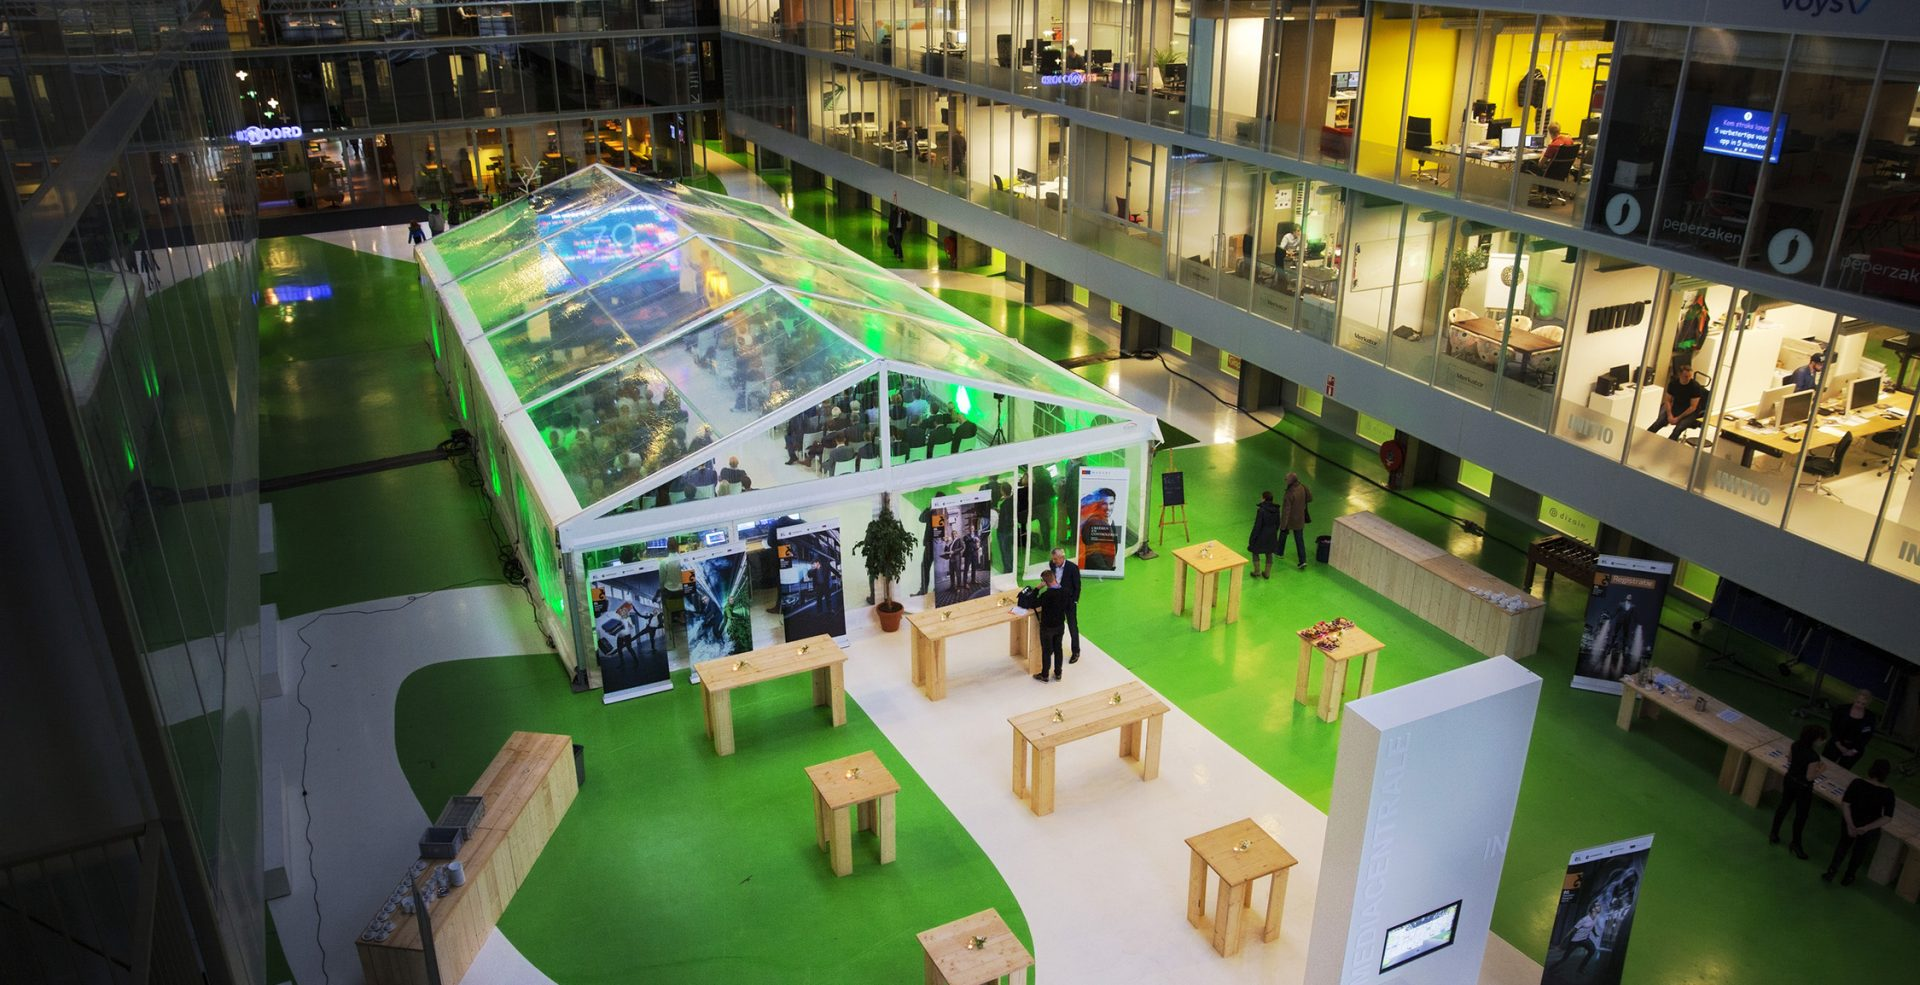 De FD Gazellen 2015 in de Centrale Hal van de Mediacentrale.